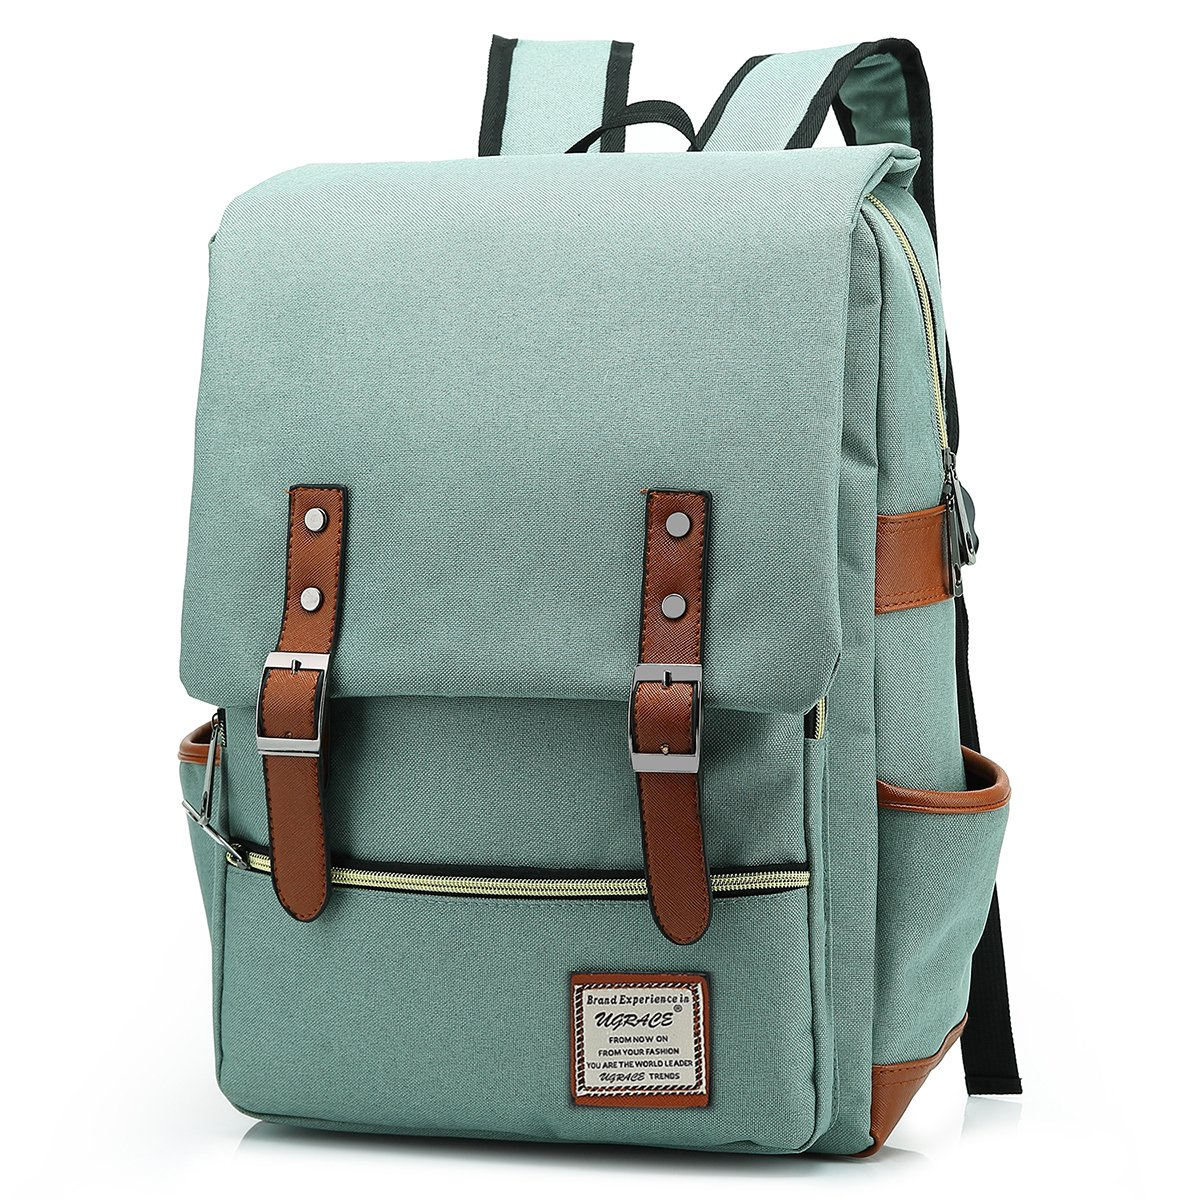 UGRACE Slim Business Laptop Backpack Elegant Casual Daypacks Outdoor Sports Rucksack School Shoulder Bag for Men Women, Tear Resistant Unique Travelling Backpack Fits up to 15.6Inch MacBook in Green by UGRACE